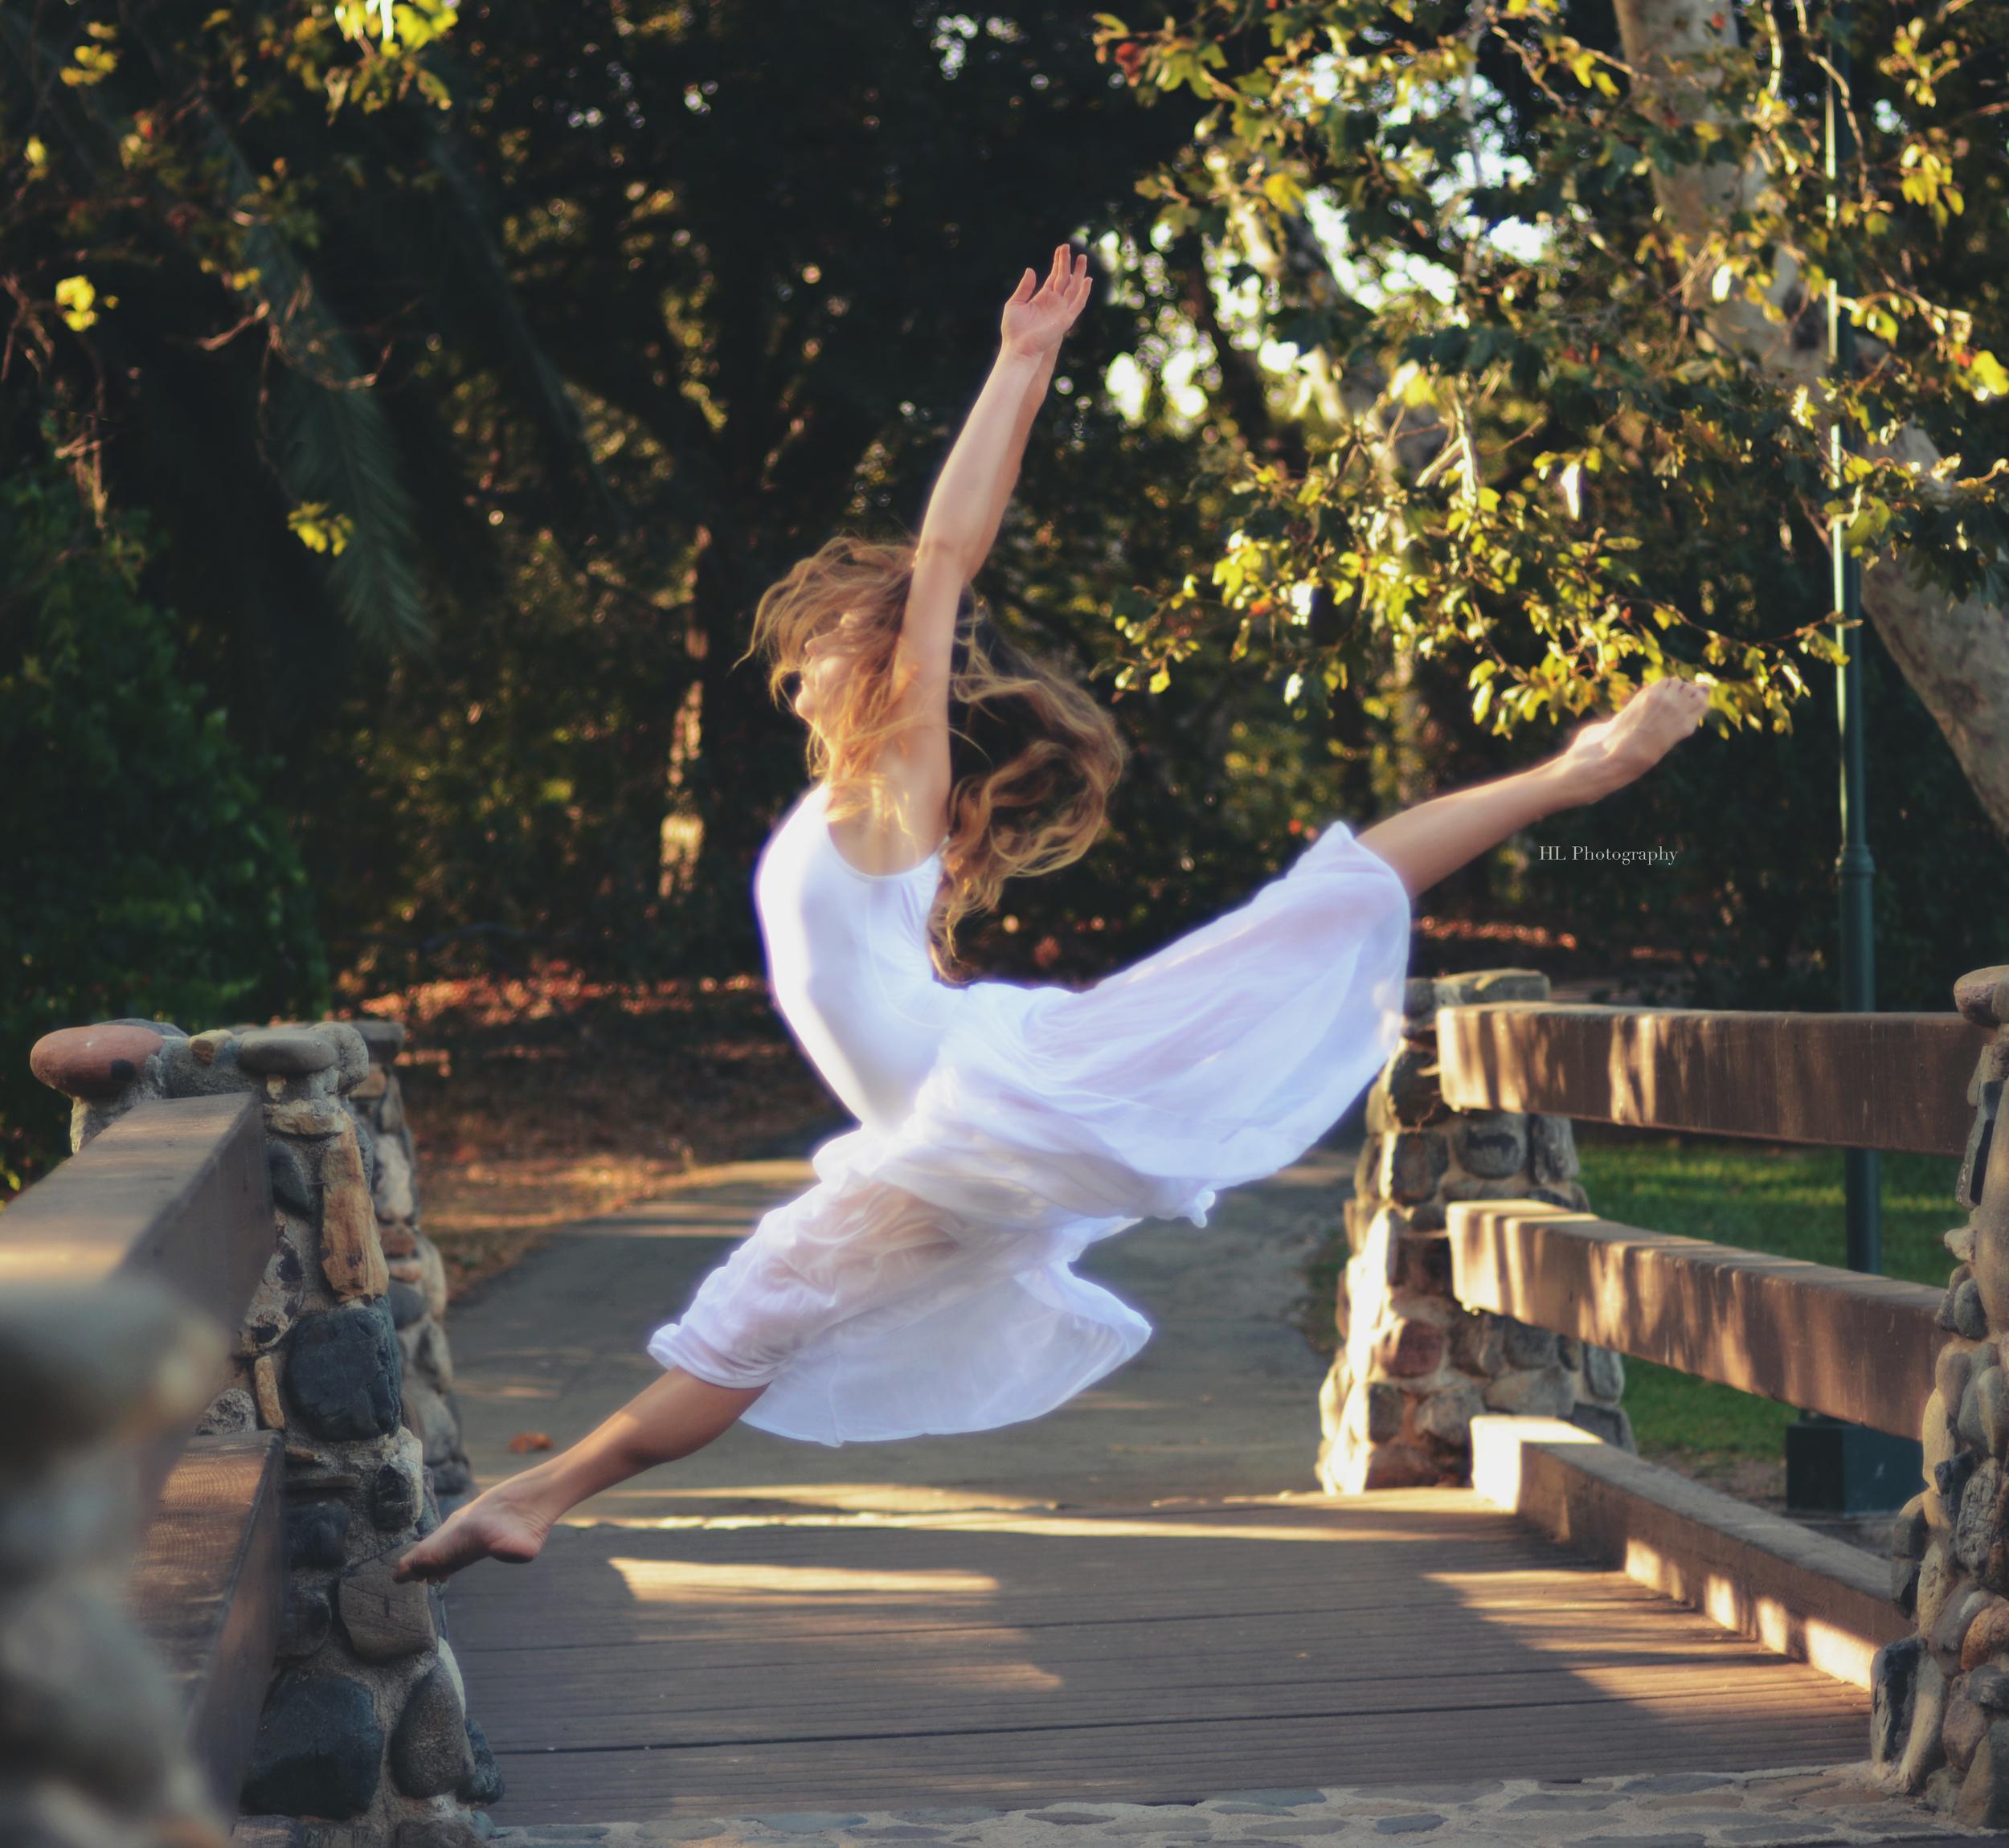 Jewel, 15. senior company ballerina@ Maple Youth Ballet, California. Photo credit: Hannah Levin